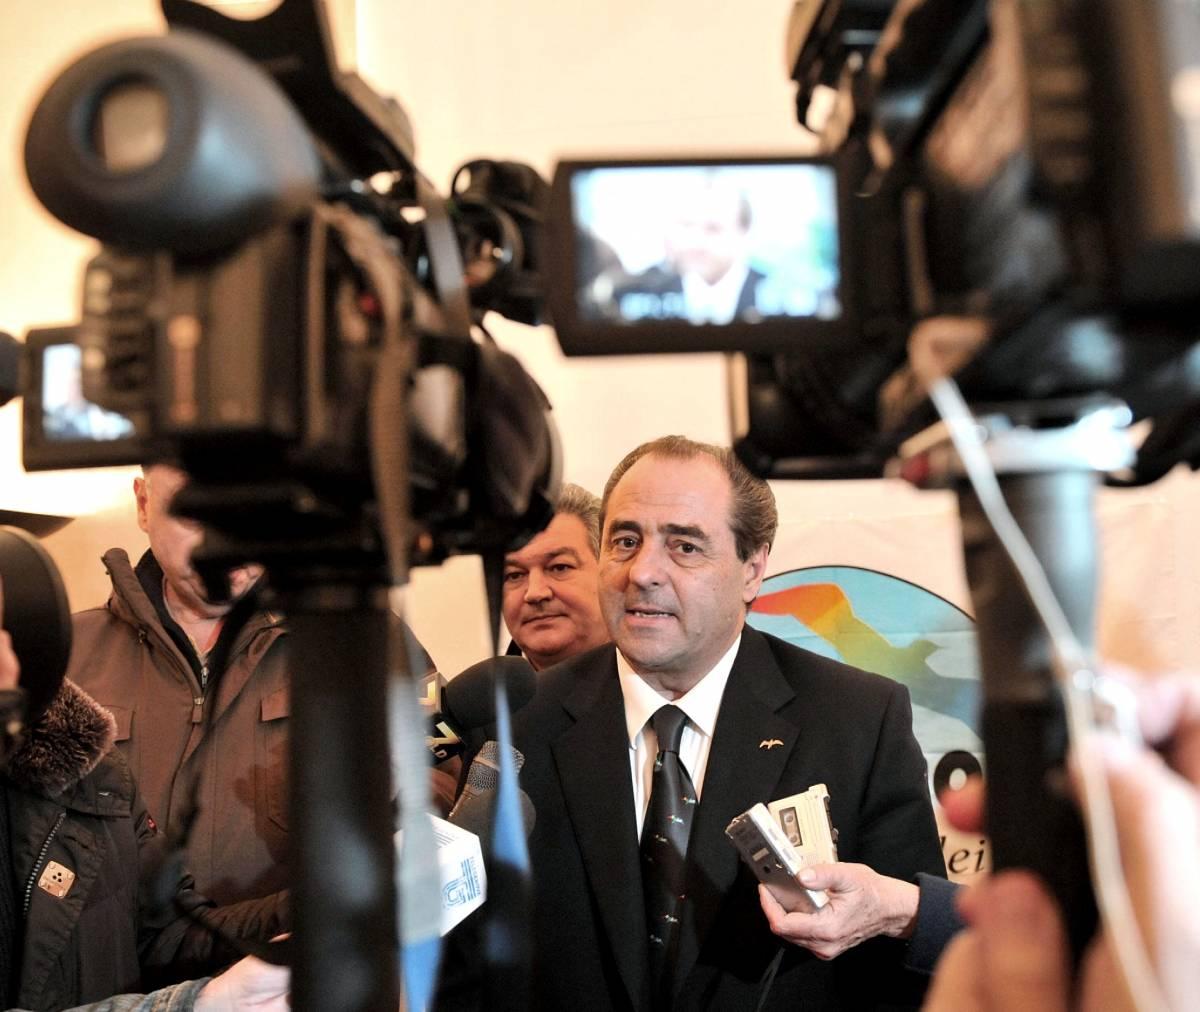 Di Pietro indagato: illeciti nei rimborsi elettorali